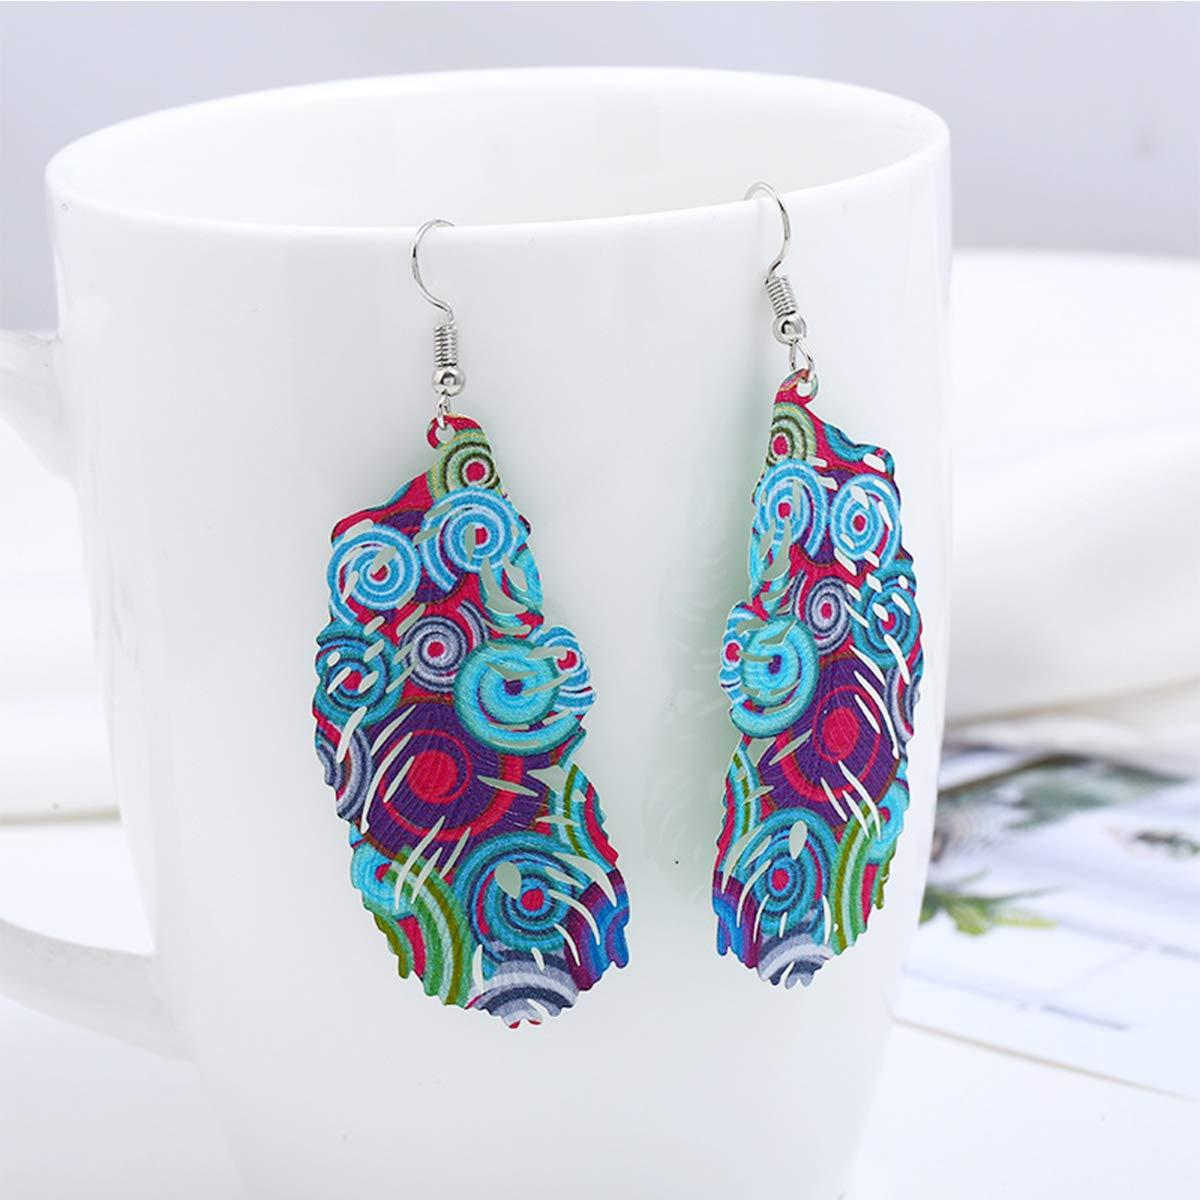 Helloriver Fashion Color Earrings Vintage Earrings Feather Stud Earrings